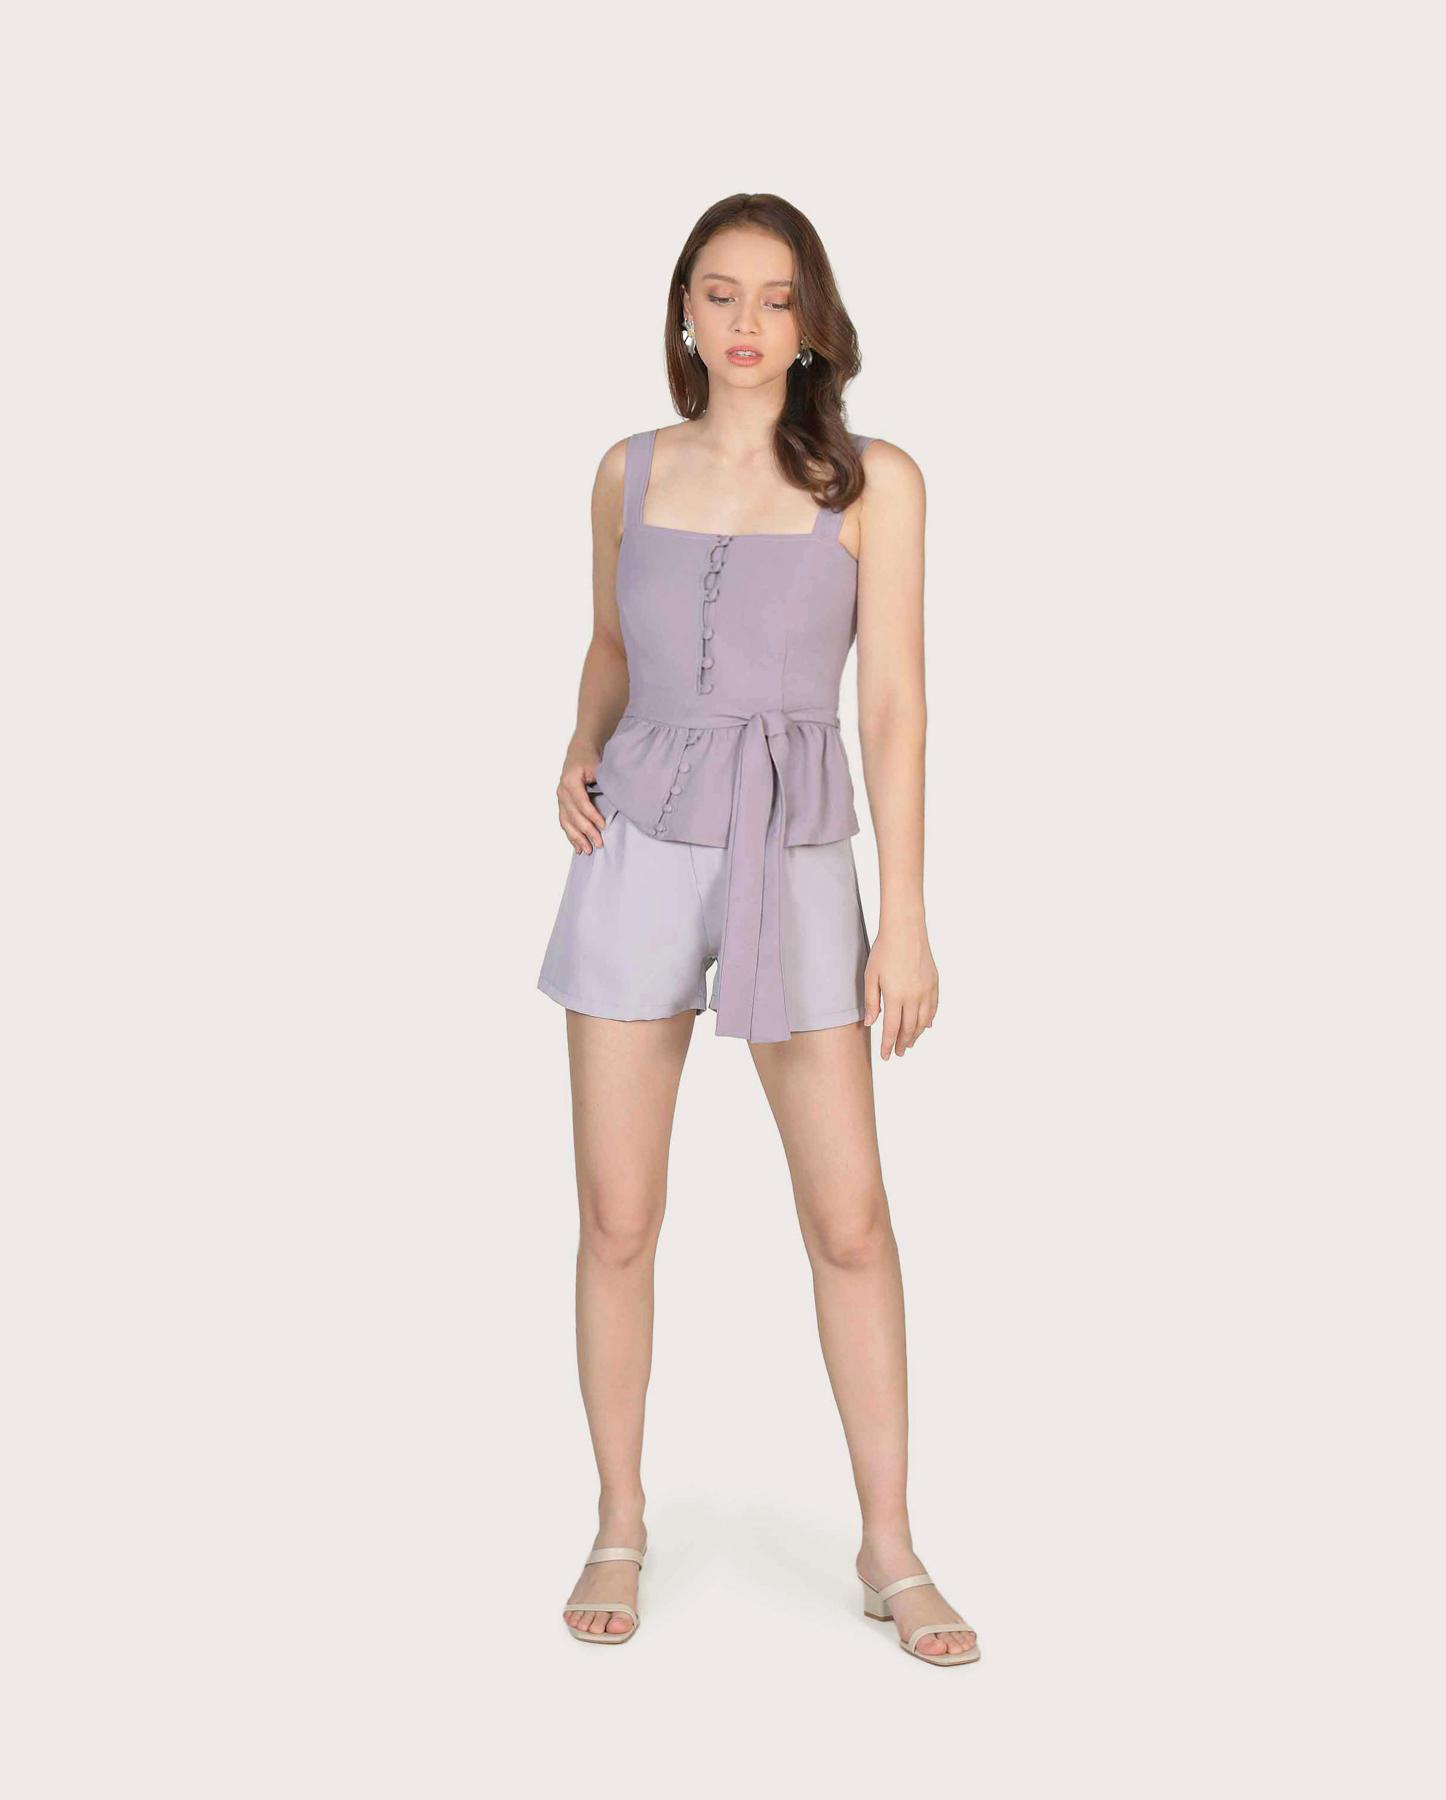 reinhart-shorts-pale-lavender-1